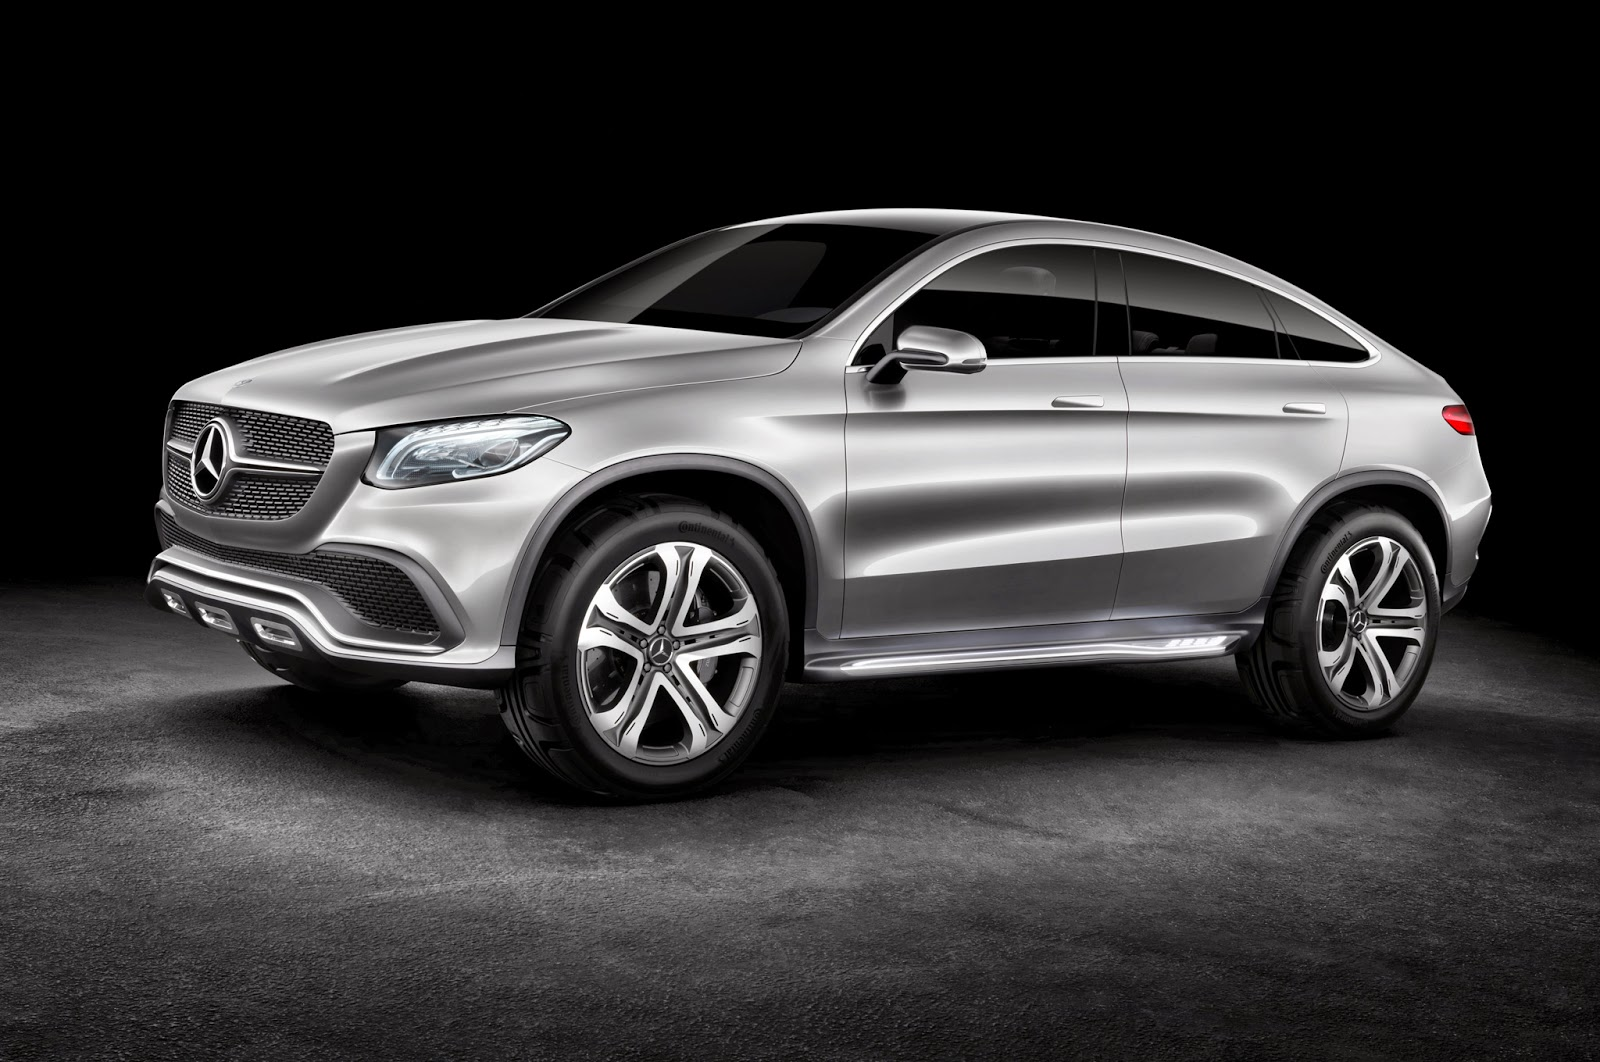 2017 Mercedes Benz Concept Coupé Suv Hybrid Cars